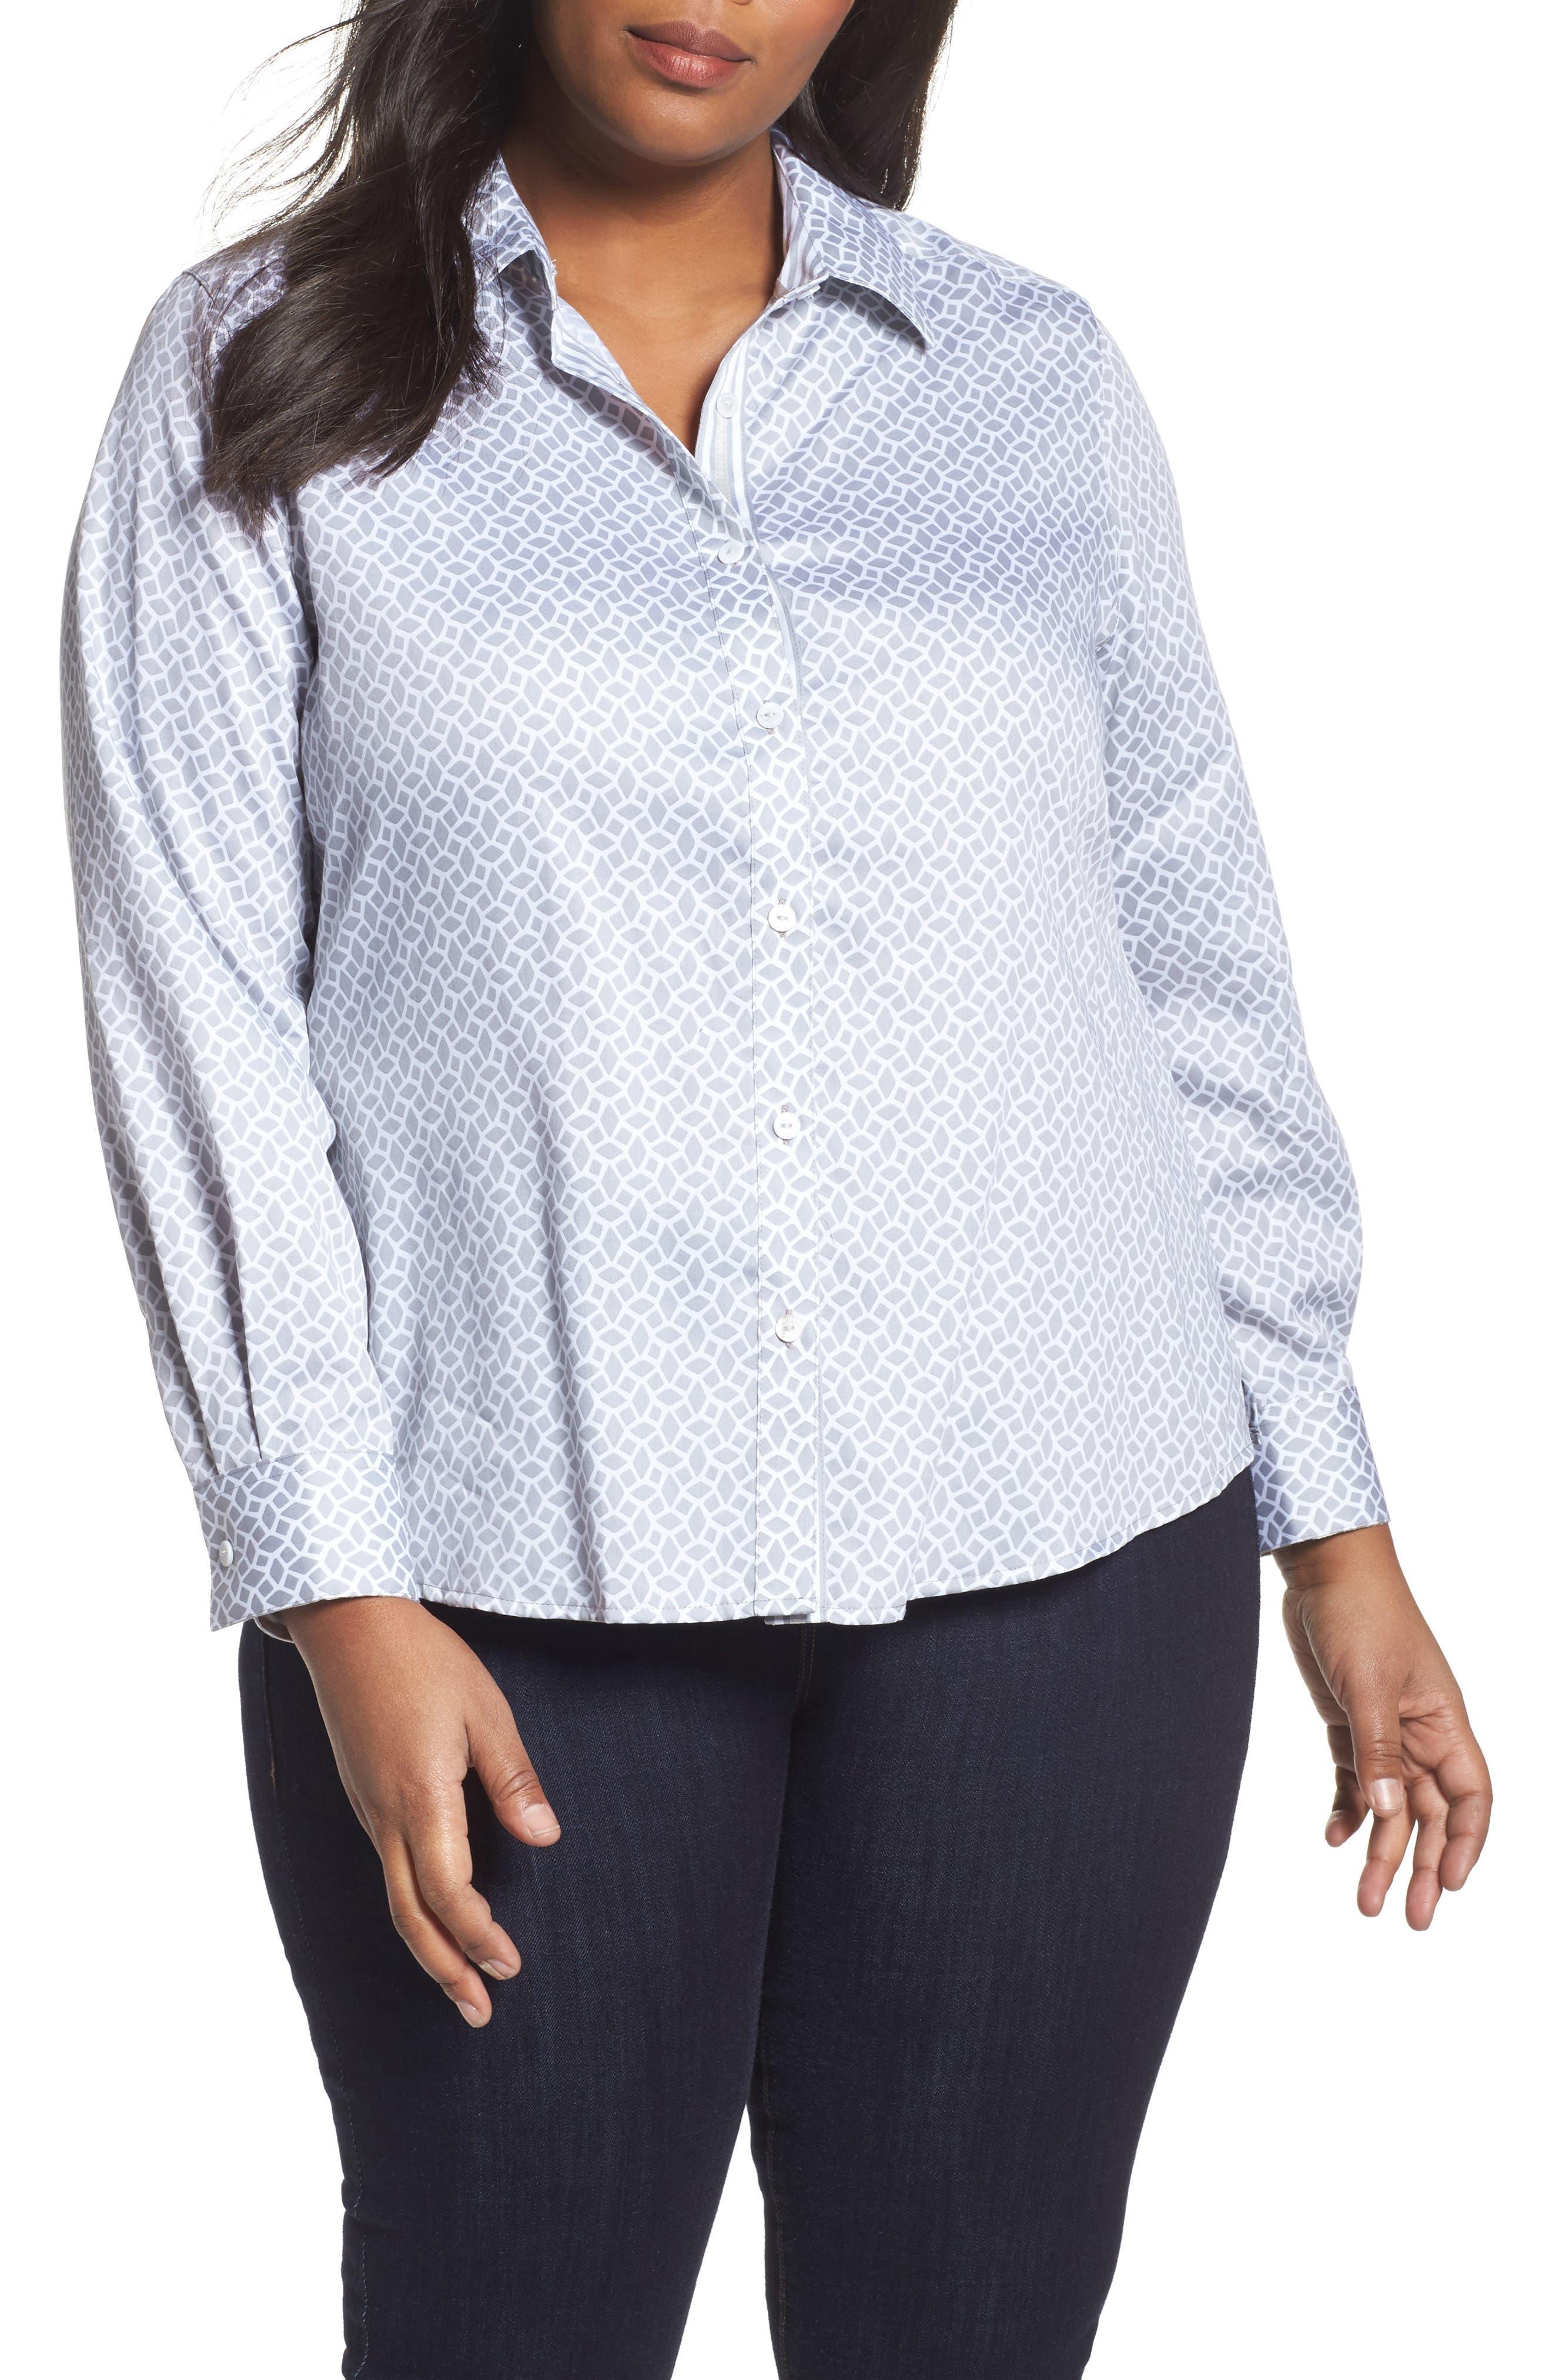 Alternate Image 1 Selected - Foxcroft Ava Geo Print Shirt (Plus Size)